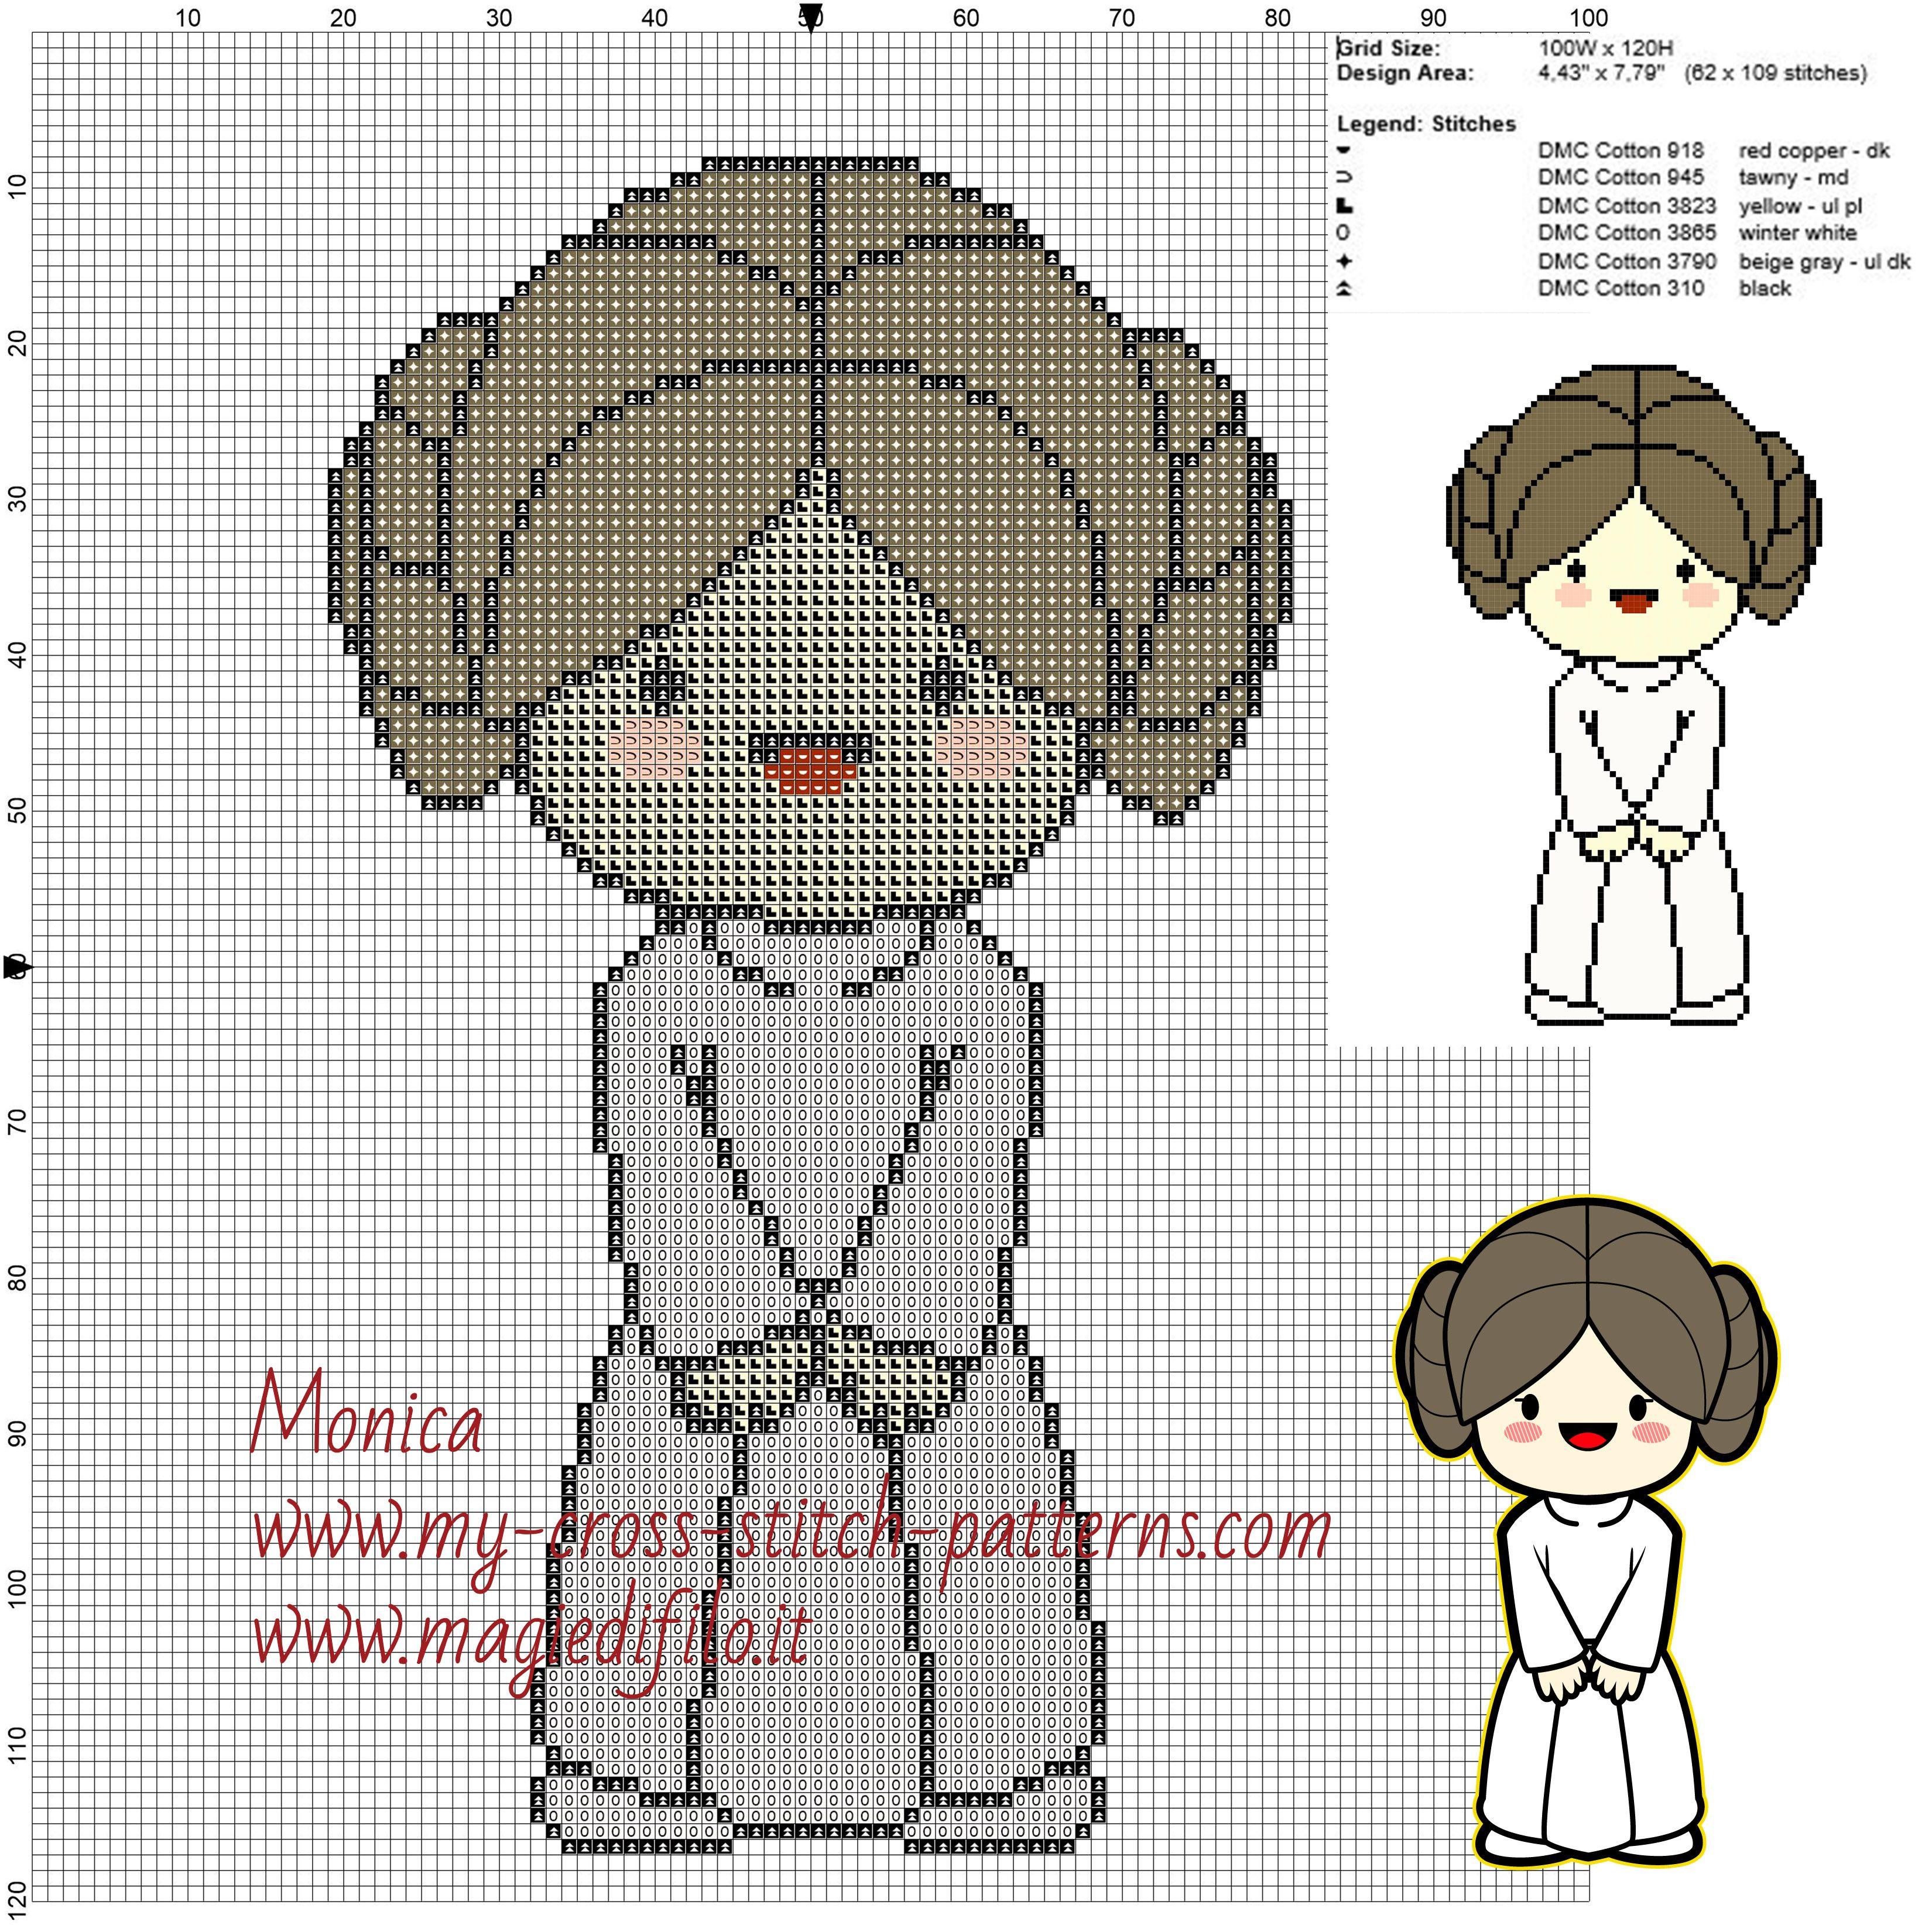 Schema punto croce principessa Leila (Star Wars) 100x120 6 colori.jpg (JPEG-afbeelding, 3300×3300 pixels)